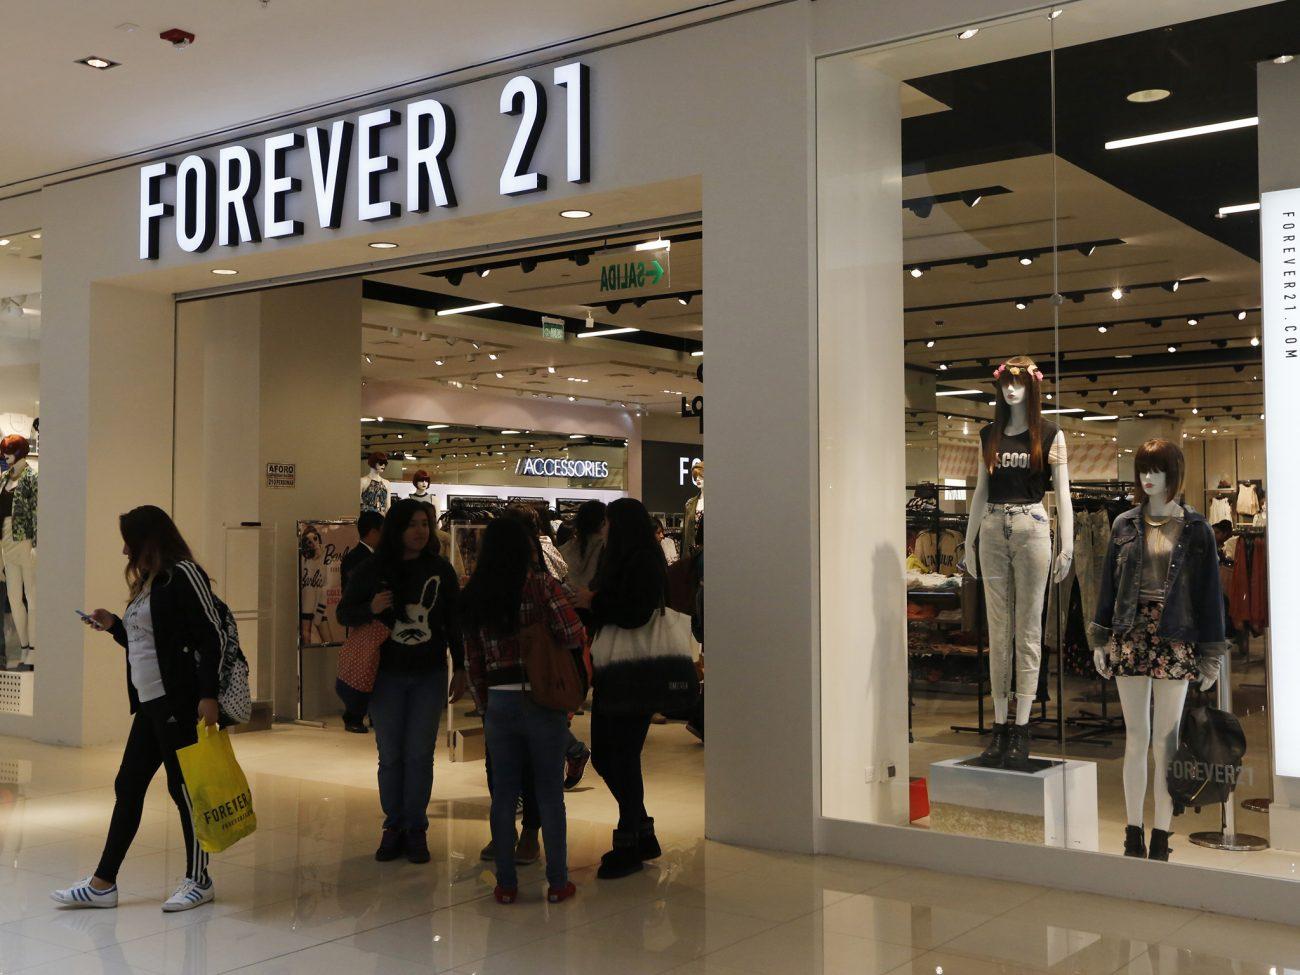 354286b9722d Έρχεται στην Ελλάδα το διάσημο brand ρούχων «Forever 21»